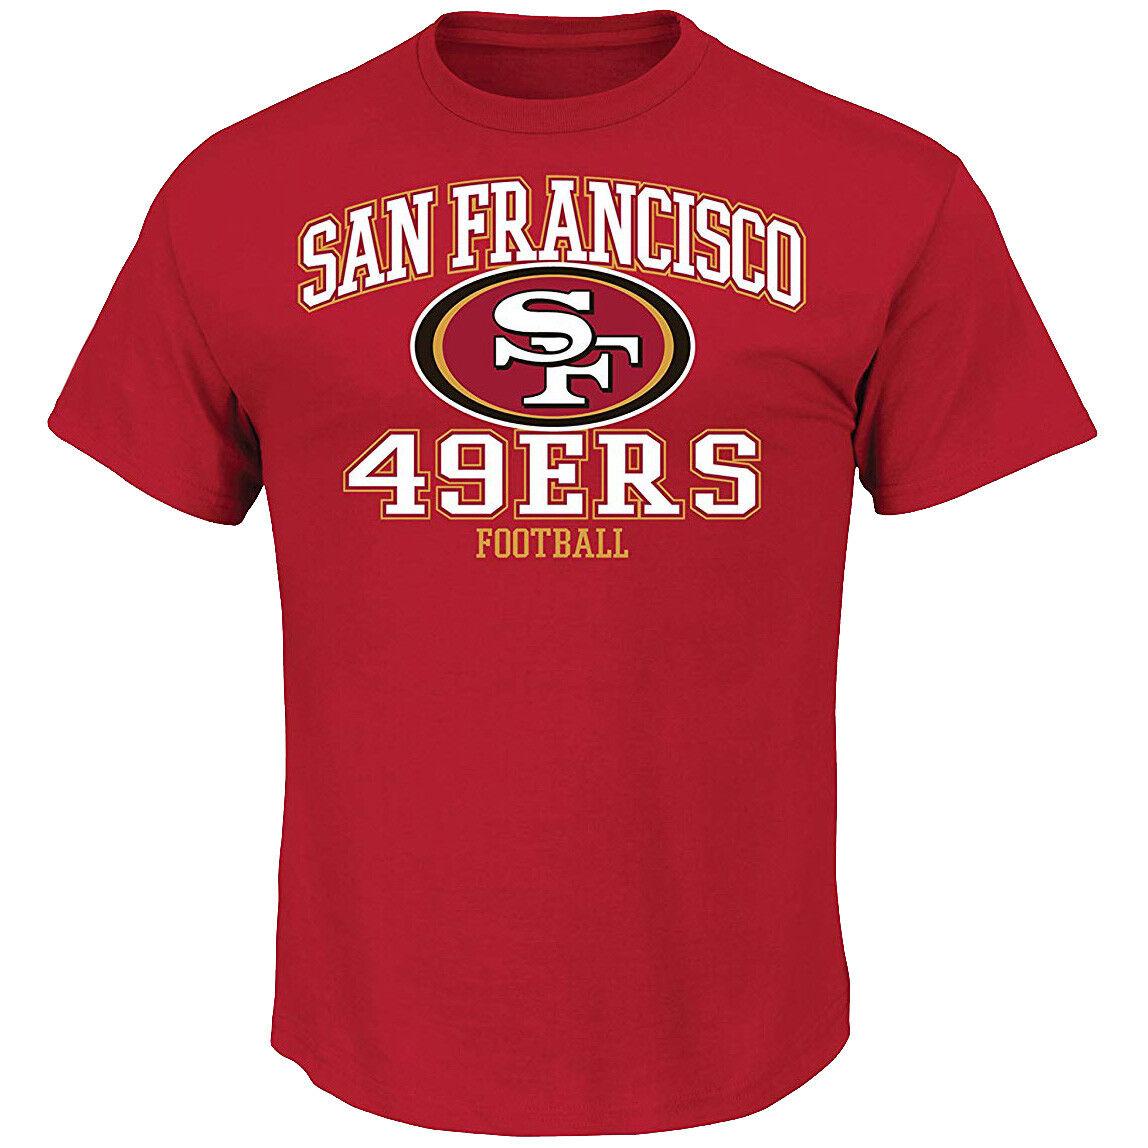 NFL Football San Francisco 49ers T-Shirt Tee Greatness rot